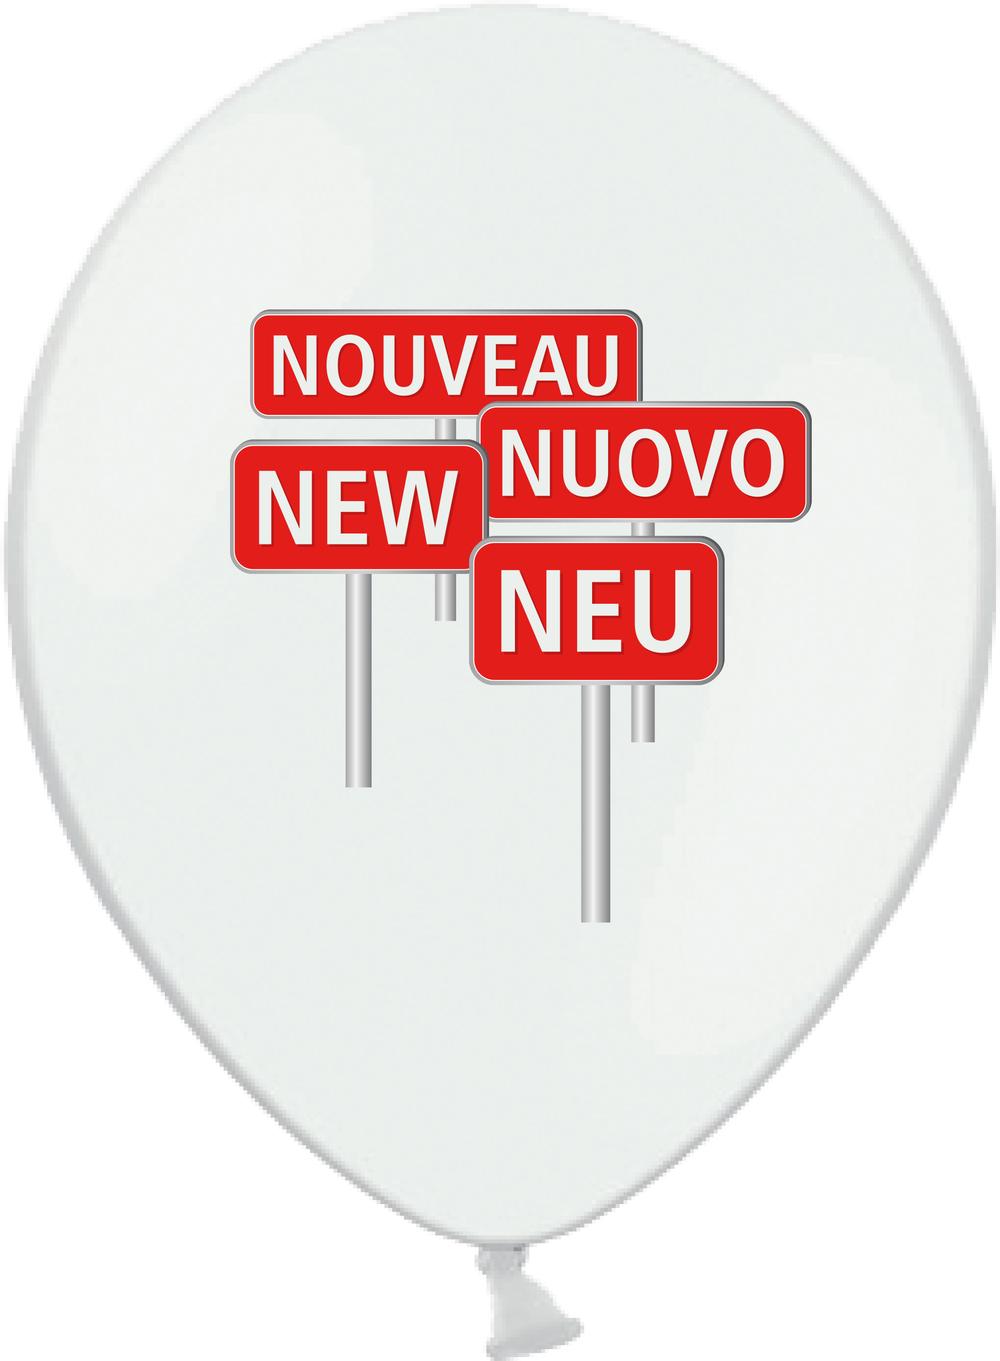 "Motiv ""Neu, New, ..."" 50 Stk. 118.90 CHF 100 Stk. 148.90 CHF 500 Stk. 479.00 CHF 1'000 Stk. 759.00 CHF"